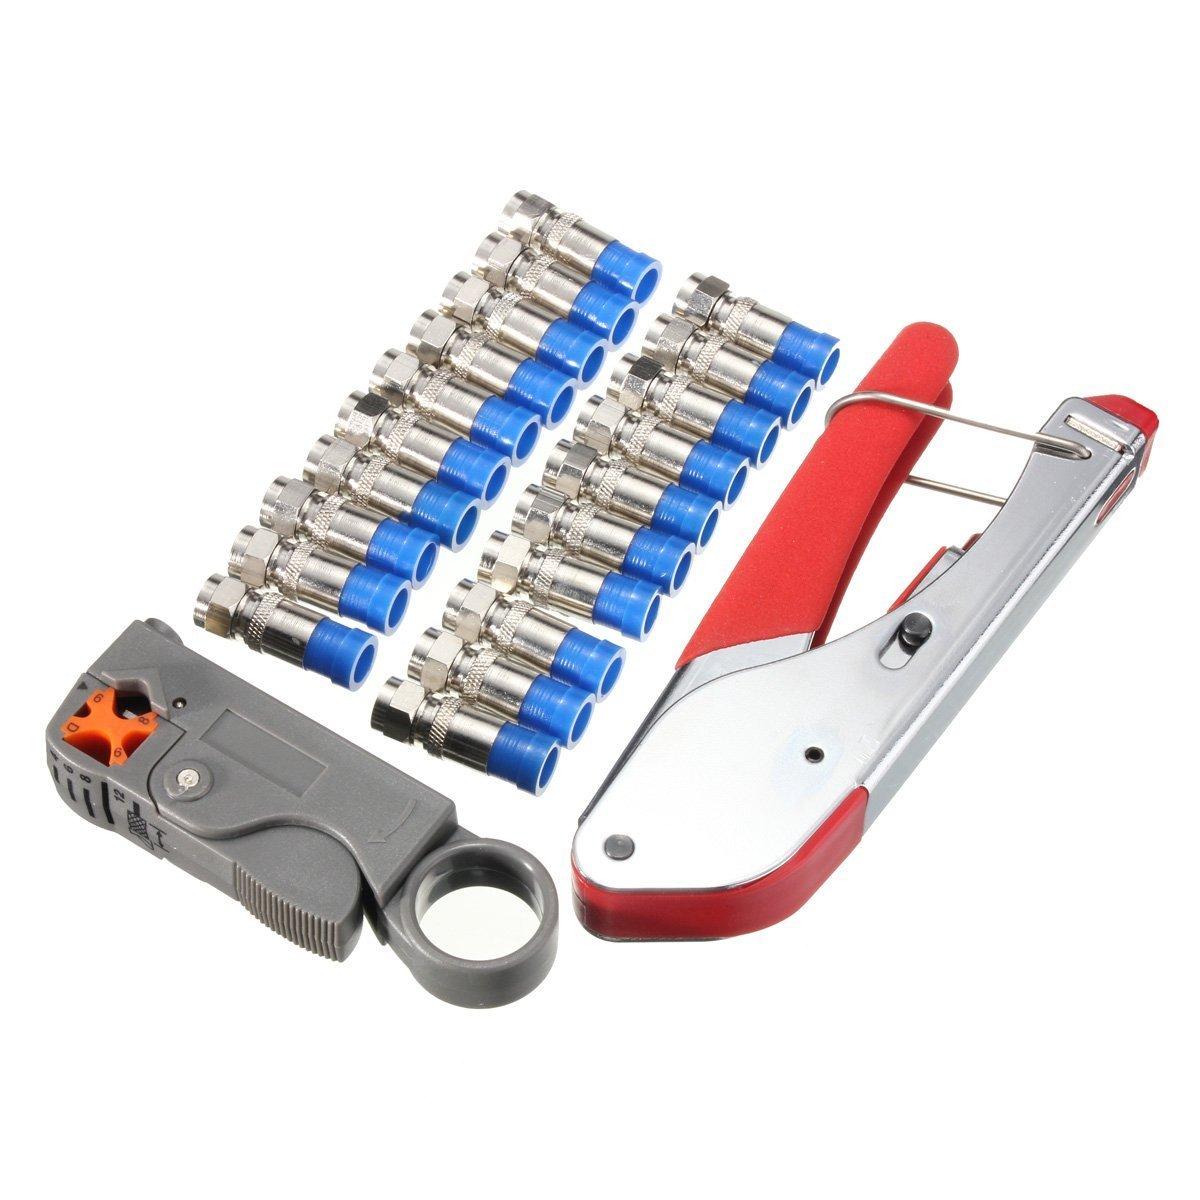 SeeKool Kit de Crimpador y Pelacable Coaxial Universal Coaxial Cable Alicates, Adecuado para Cables RG58/ 59/62/ 6/ 3V2V/ 4C/ 5C,20x Coaxial Cable F ...